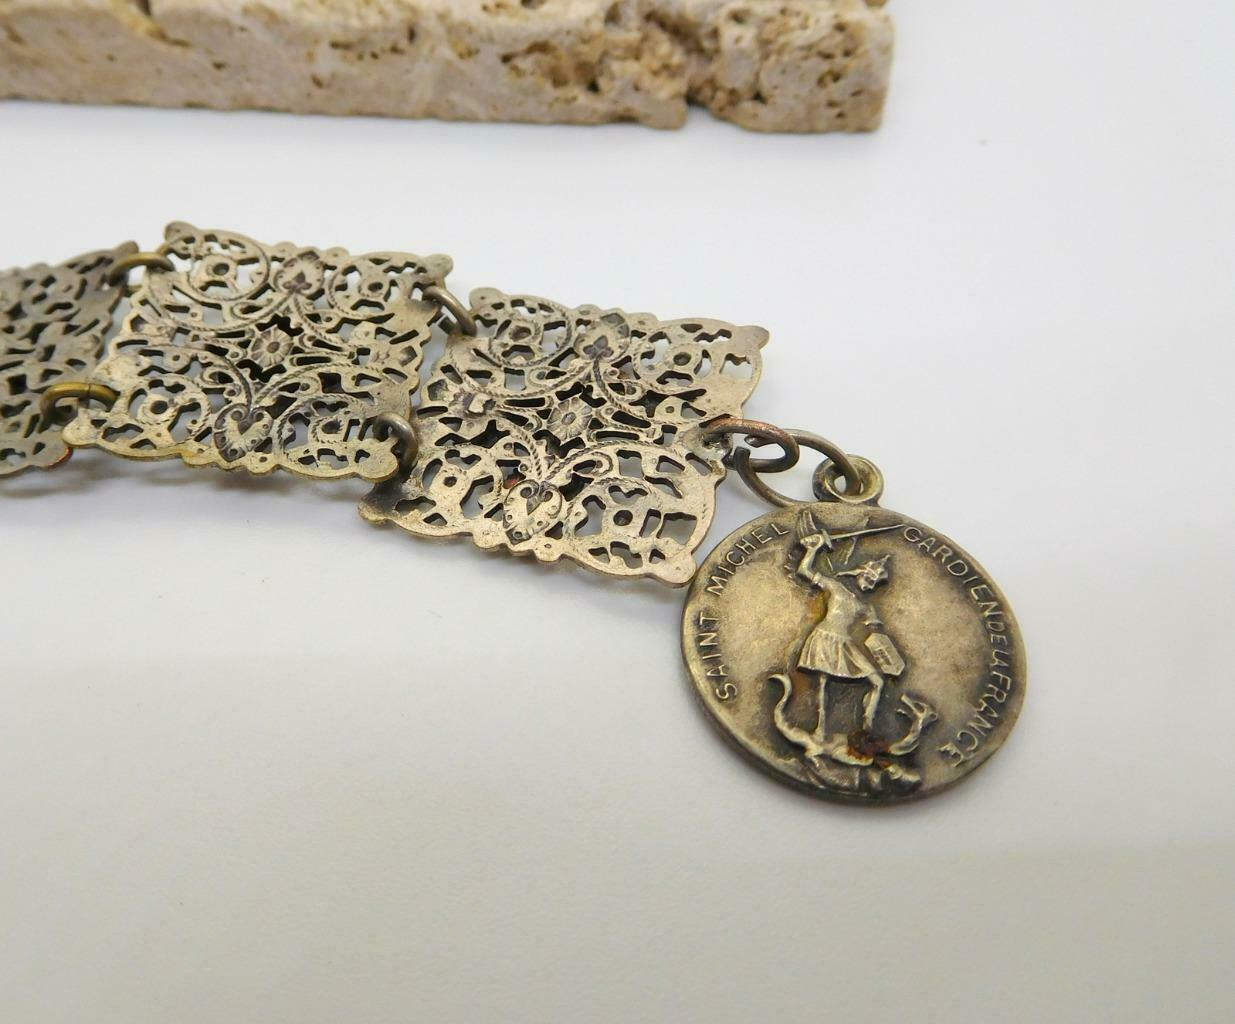 Vintage French Silver Filigree Mont St Michel Charm Panel Bracelet U36 image 5